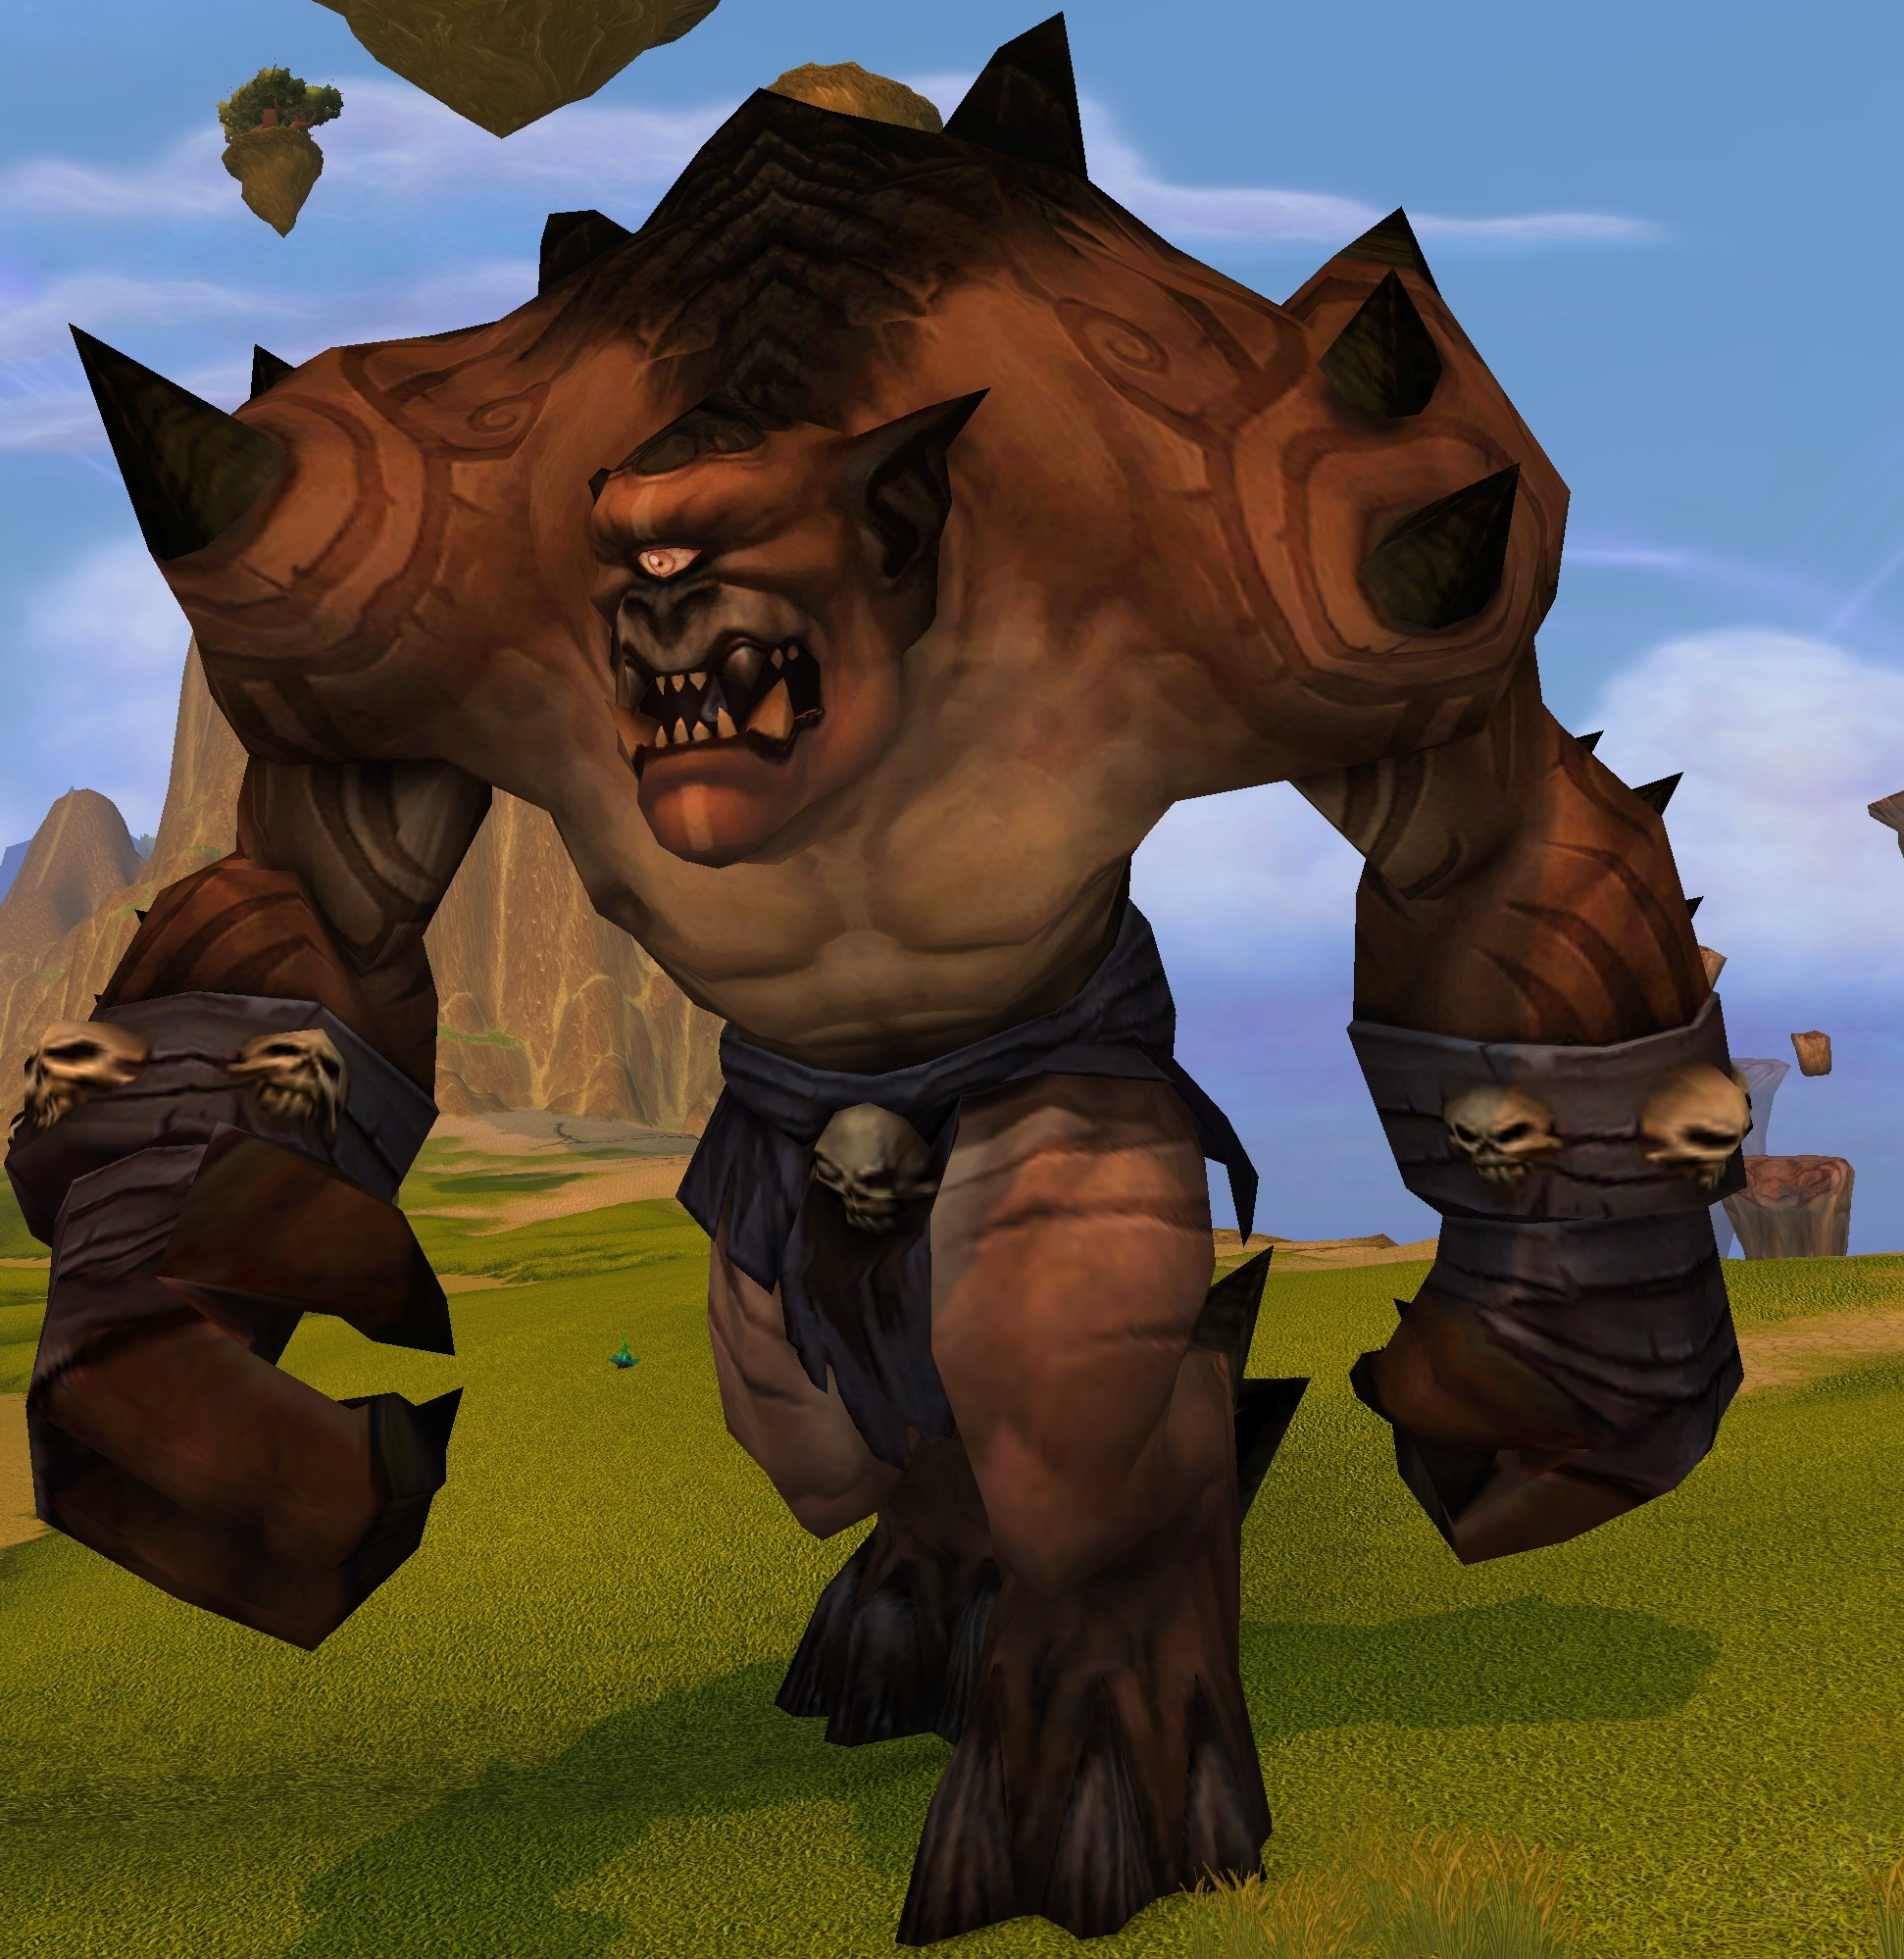 Durn the Hungerer - NPC - World of Warcraft